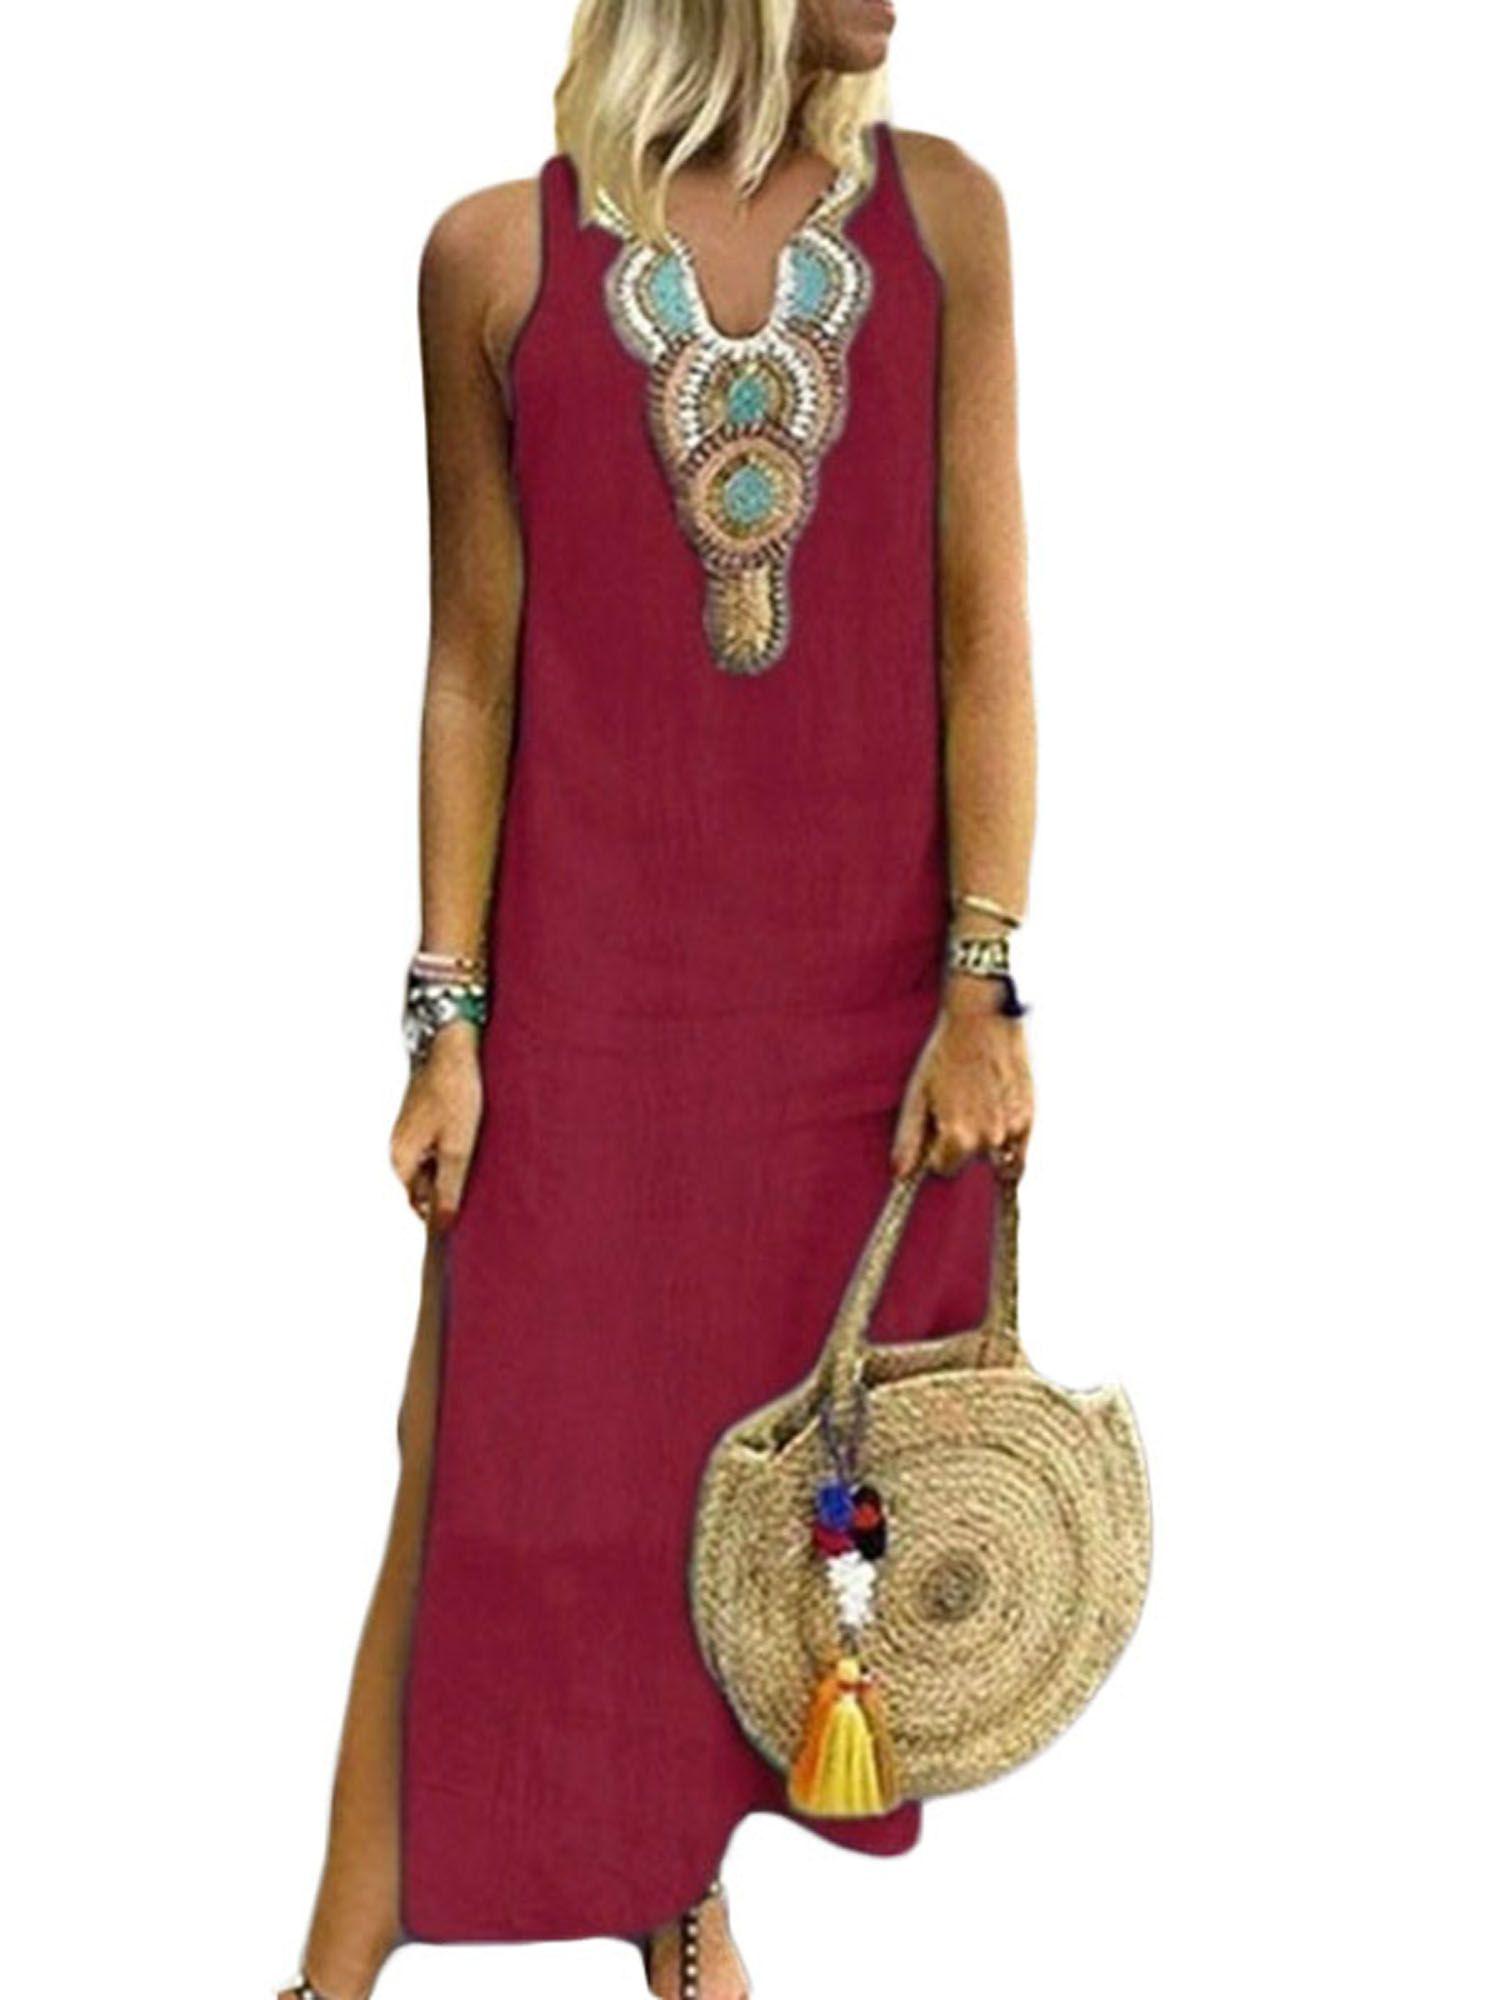 Wodstyle Women S Plus Size Sleeveless V Neck Boho Split Loose Long Maxi Dress Walmart Com Long Maxi Dress Plus Size Dresses Uk Long Sleeve Print Dress [ 2000 x 1500 Pixel ]